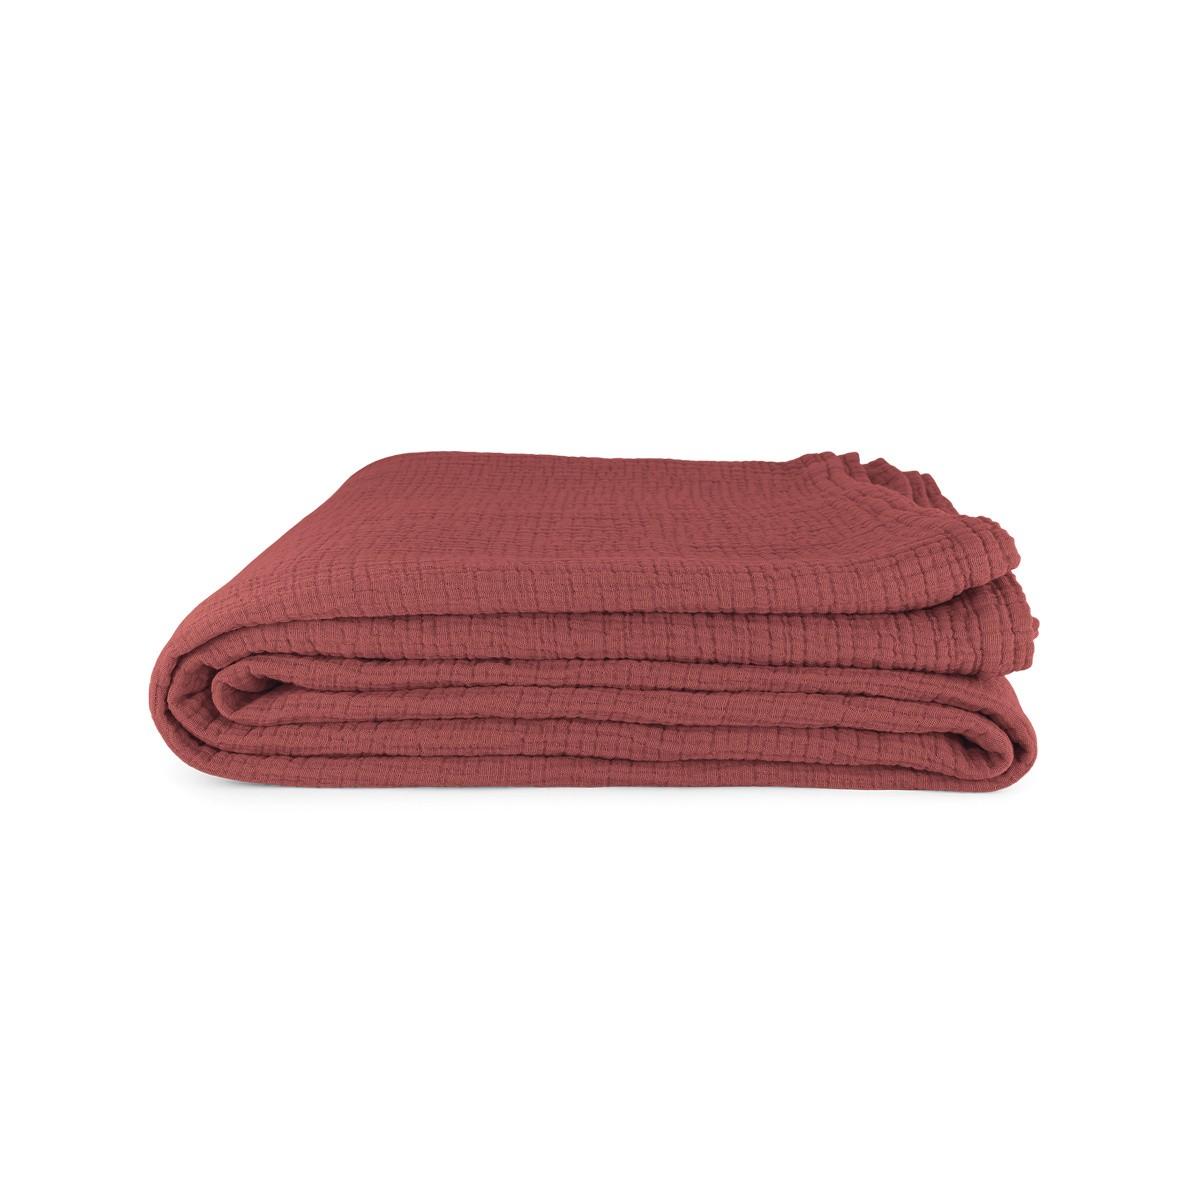 Allegra Tablecloth in Brick Red Cotton Gauze